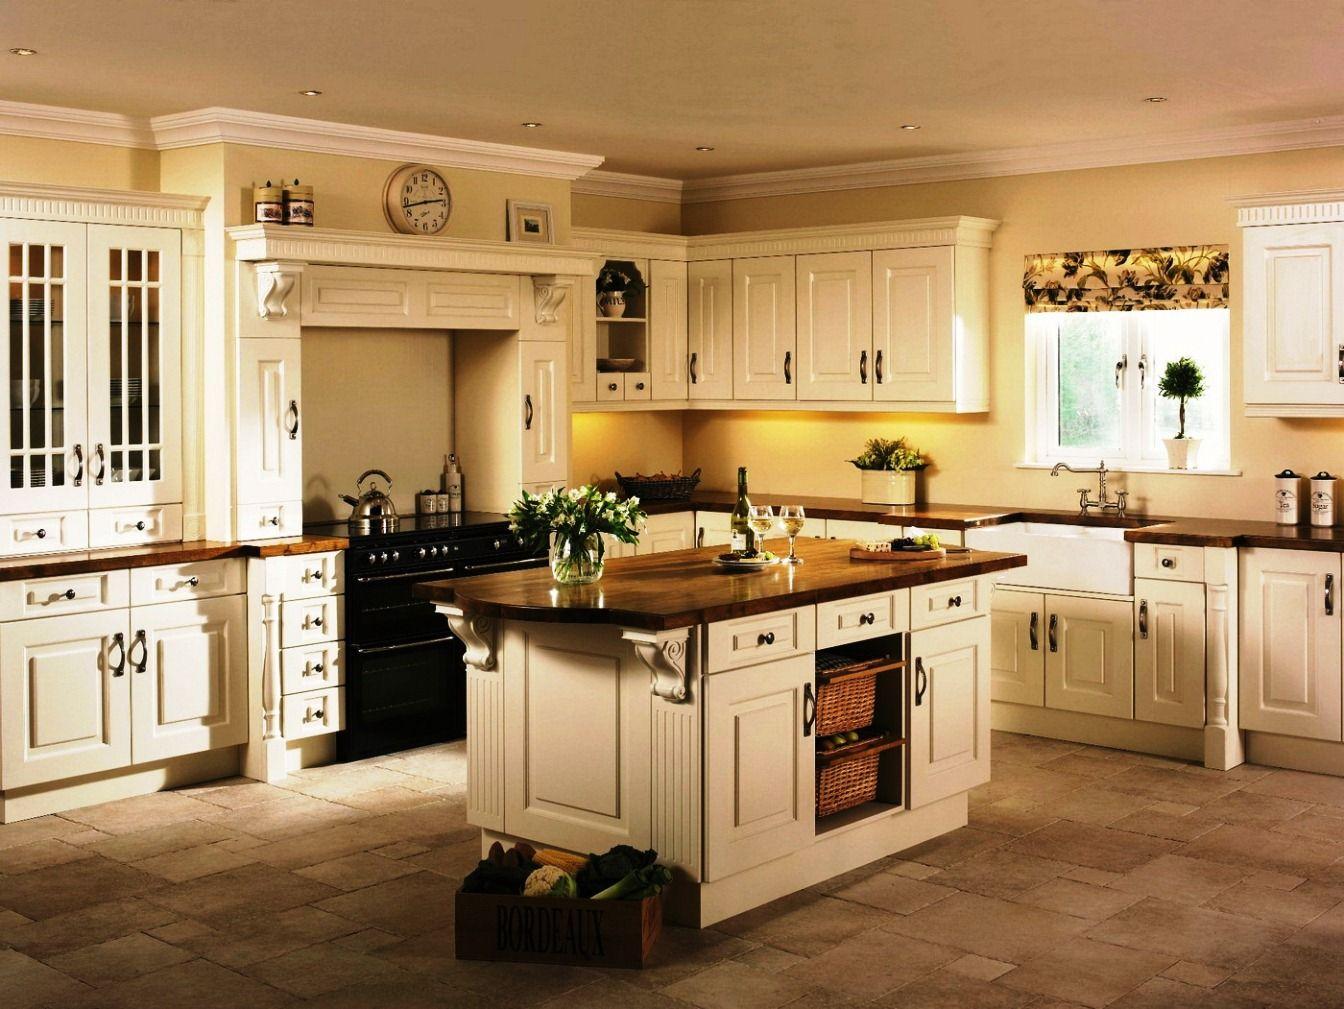 Image Of Cream Kitchen Cabinets Design Ideas Country Kitchen